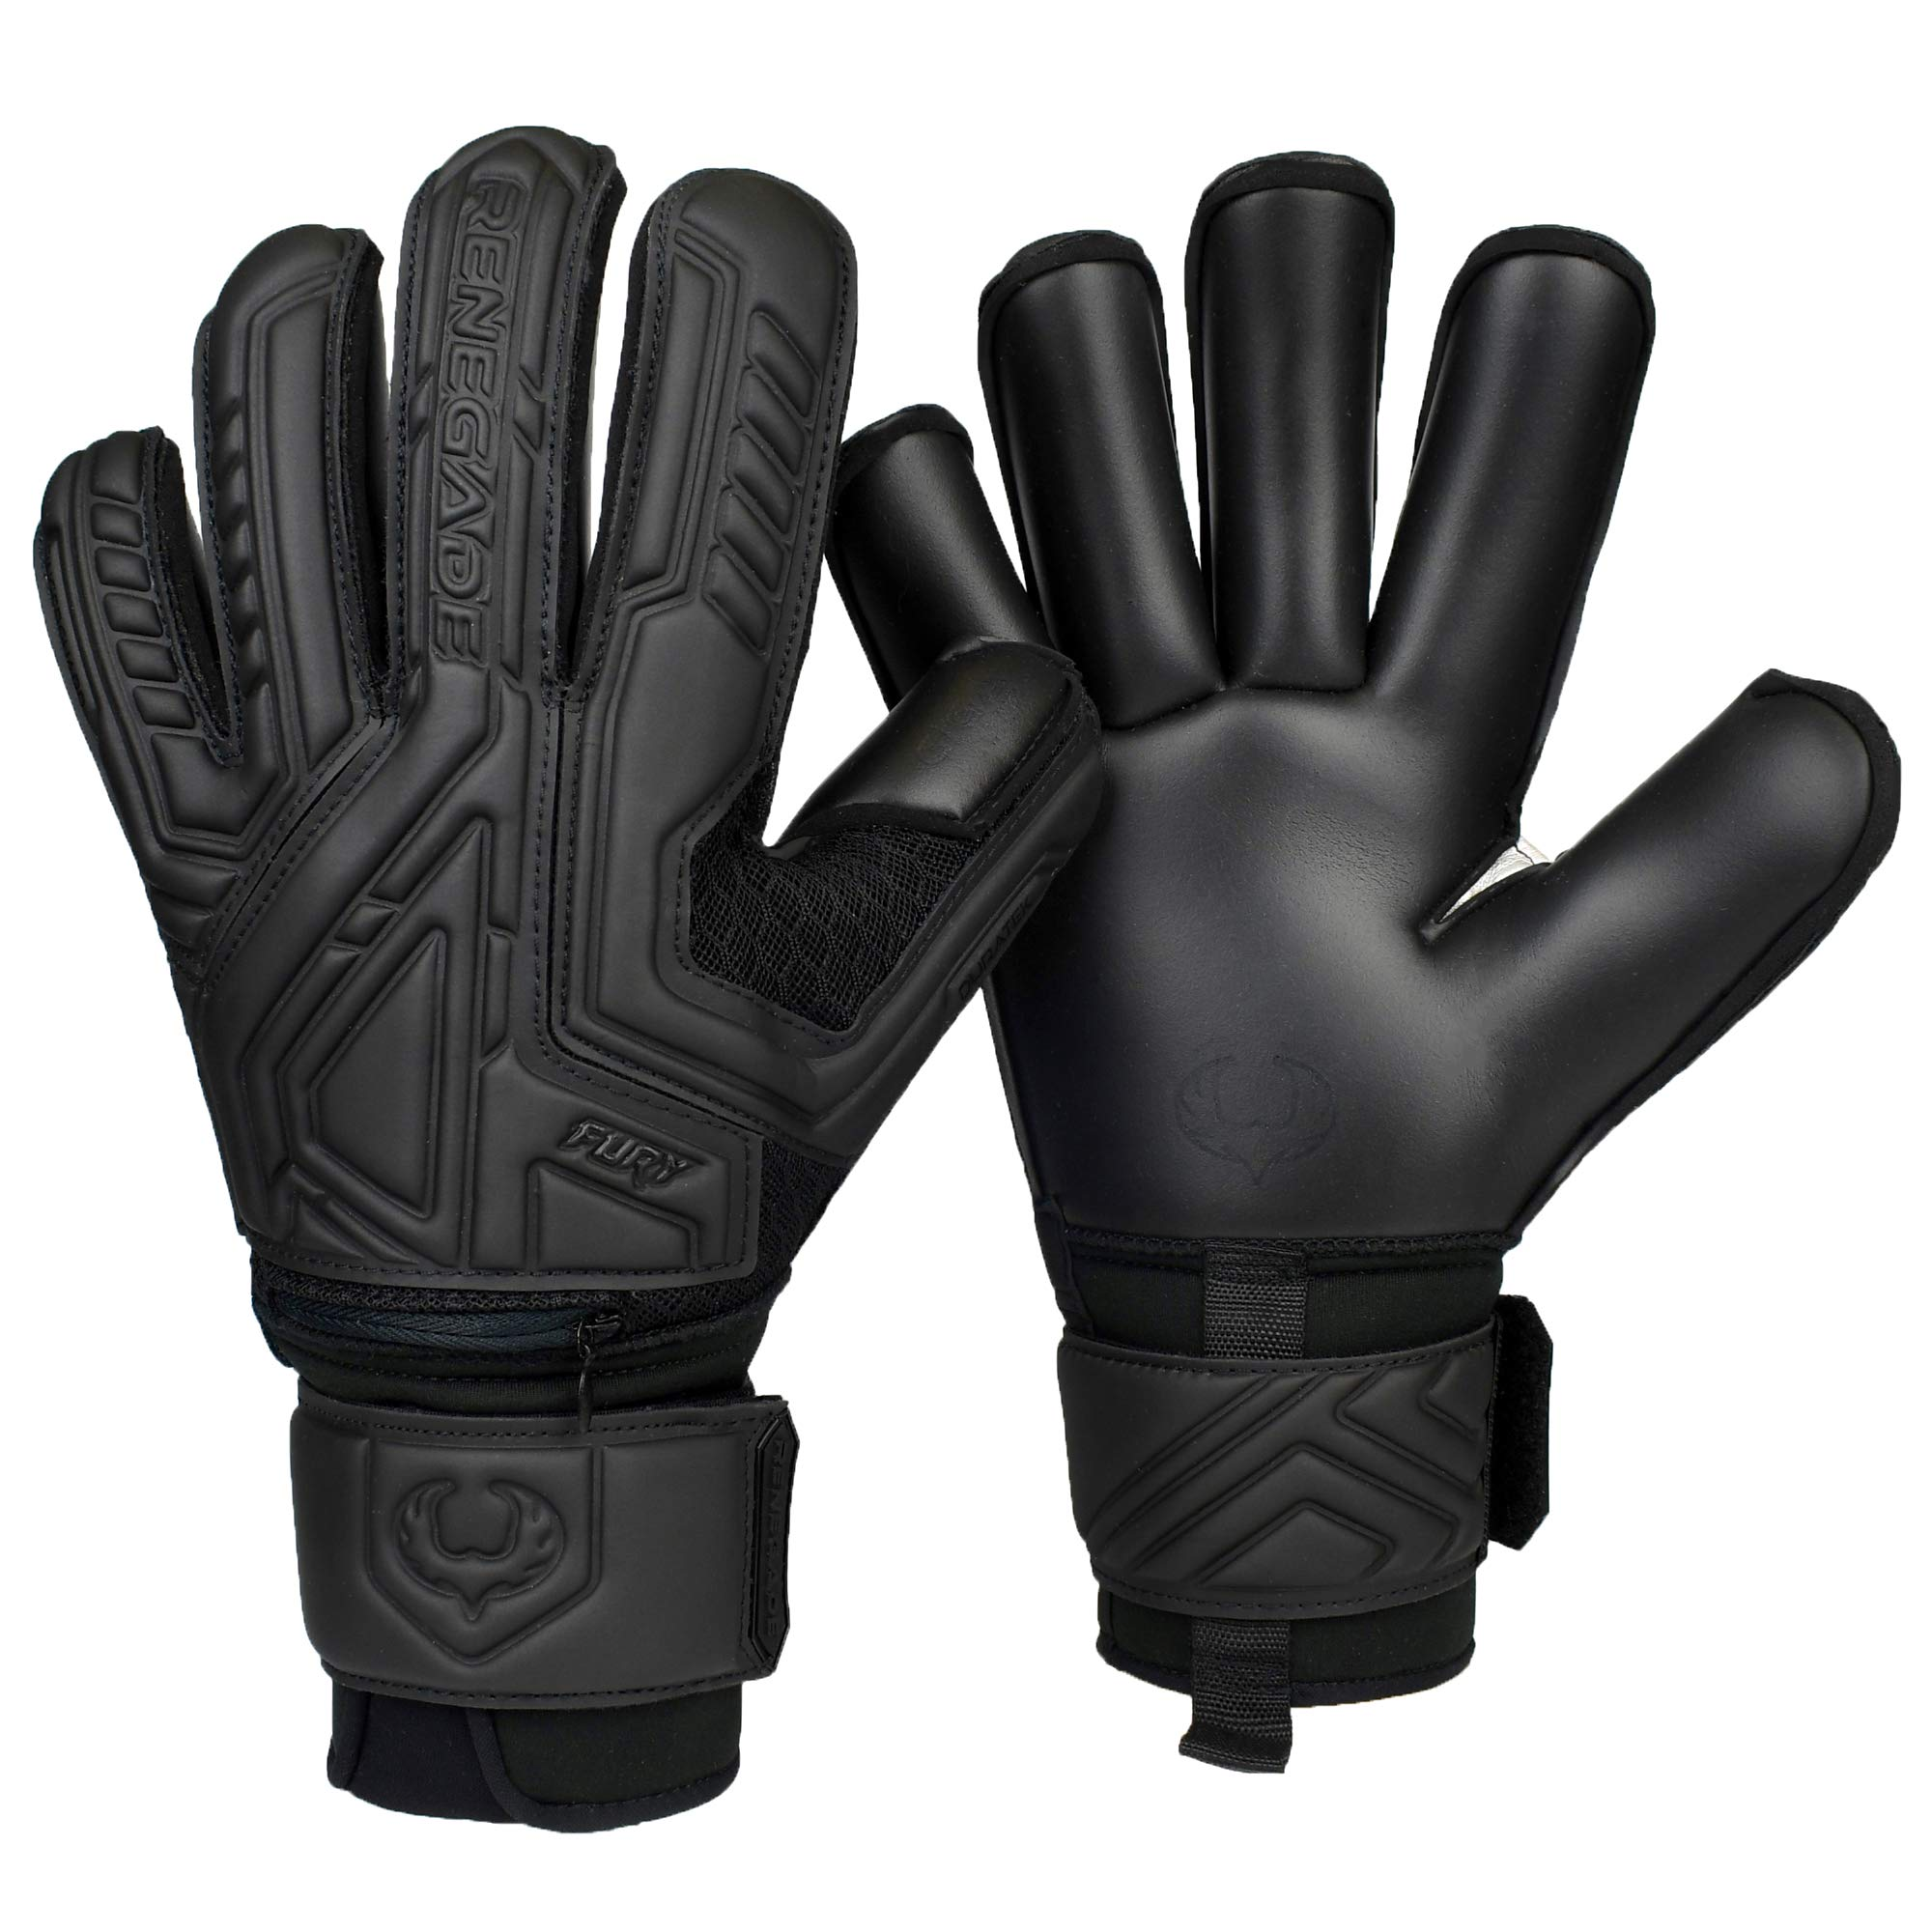 Renegade GK Fury Goalie Gloves with Microbe-Guard (Sizes 7-11, 7 Styles, Level 4) Pro-Tek Fingersaves & 4+3MM Giga Grip | High Performance Pro-Level Goalkeeper Glove | Based in The USA